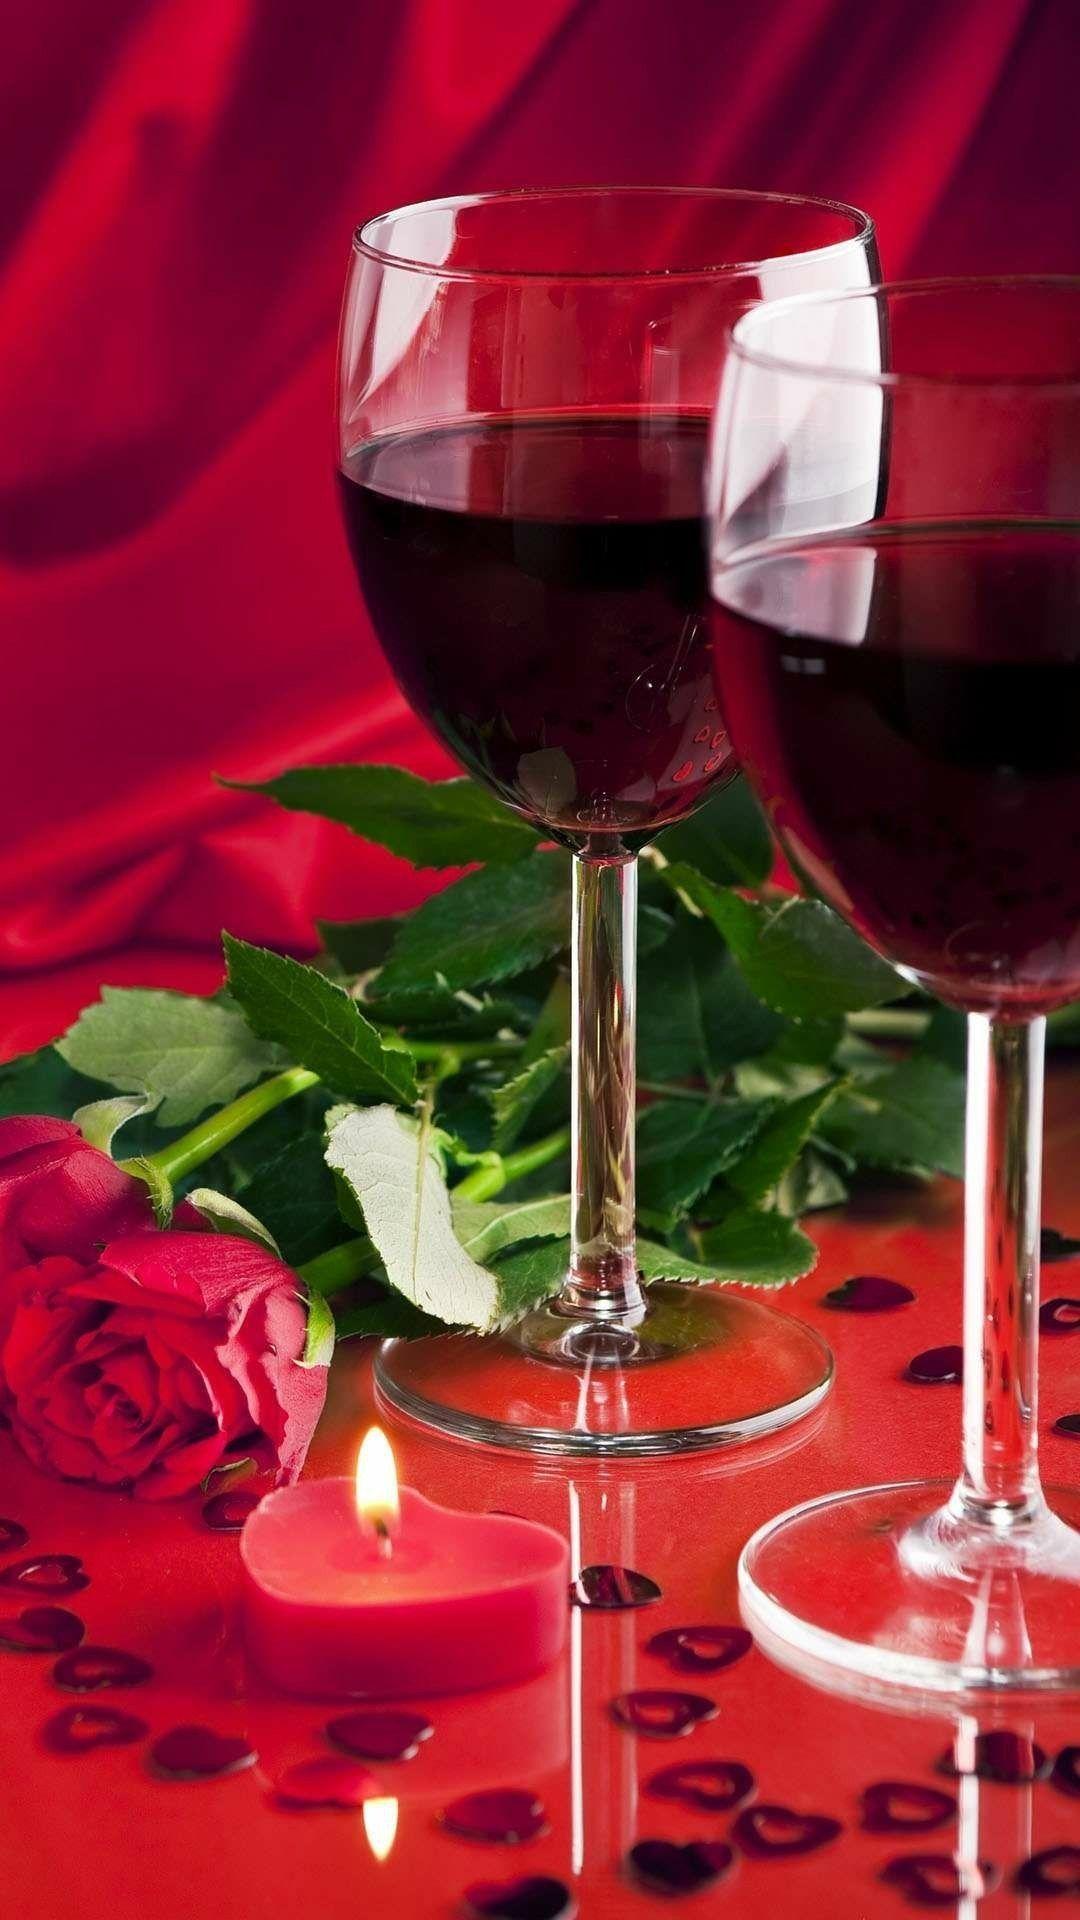 Unbetitelt Wine Glass Images Flowers Wine Wine Photography